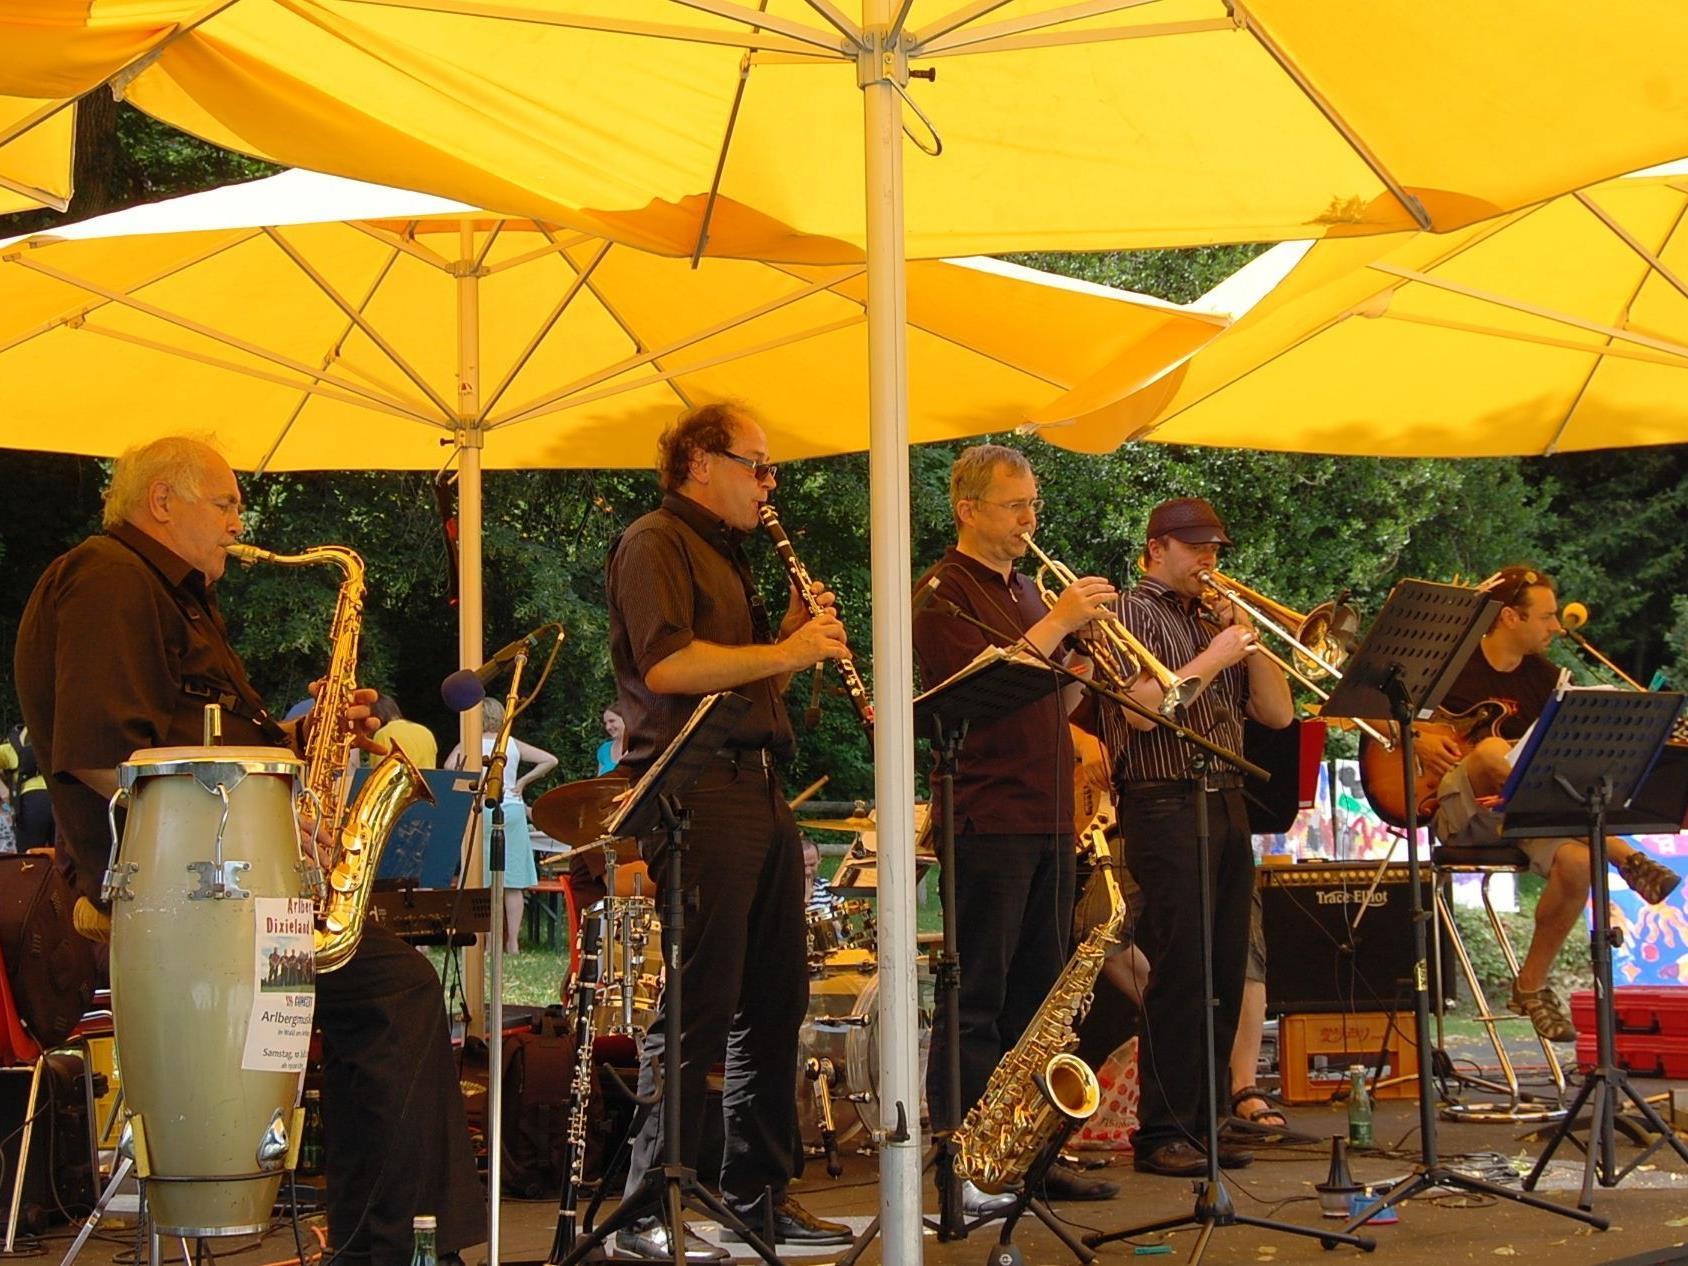 Arlberg Dixie Band